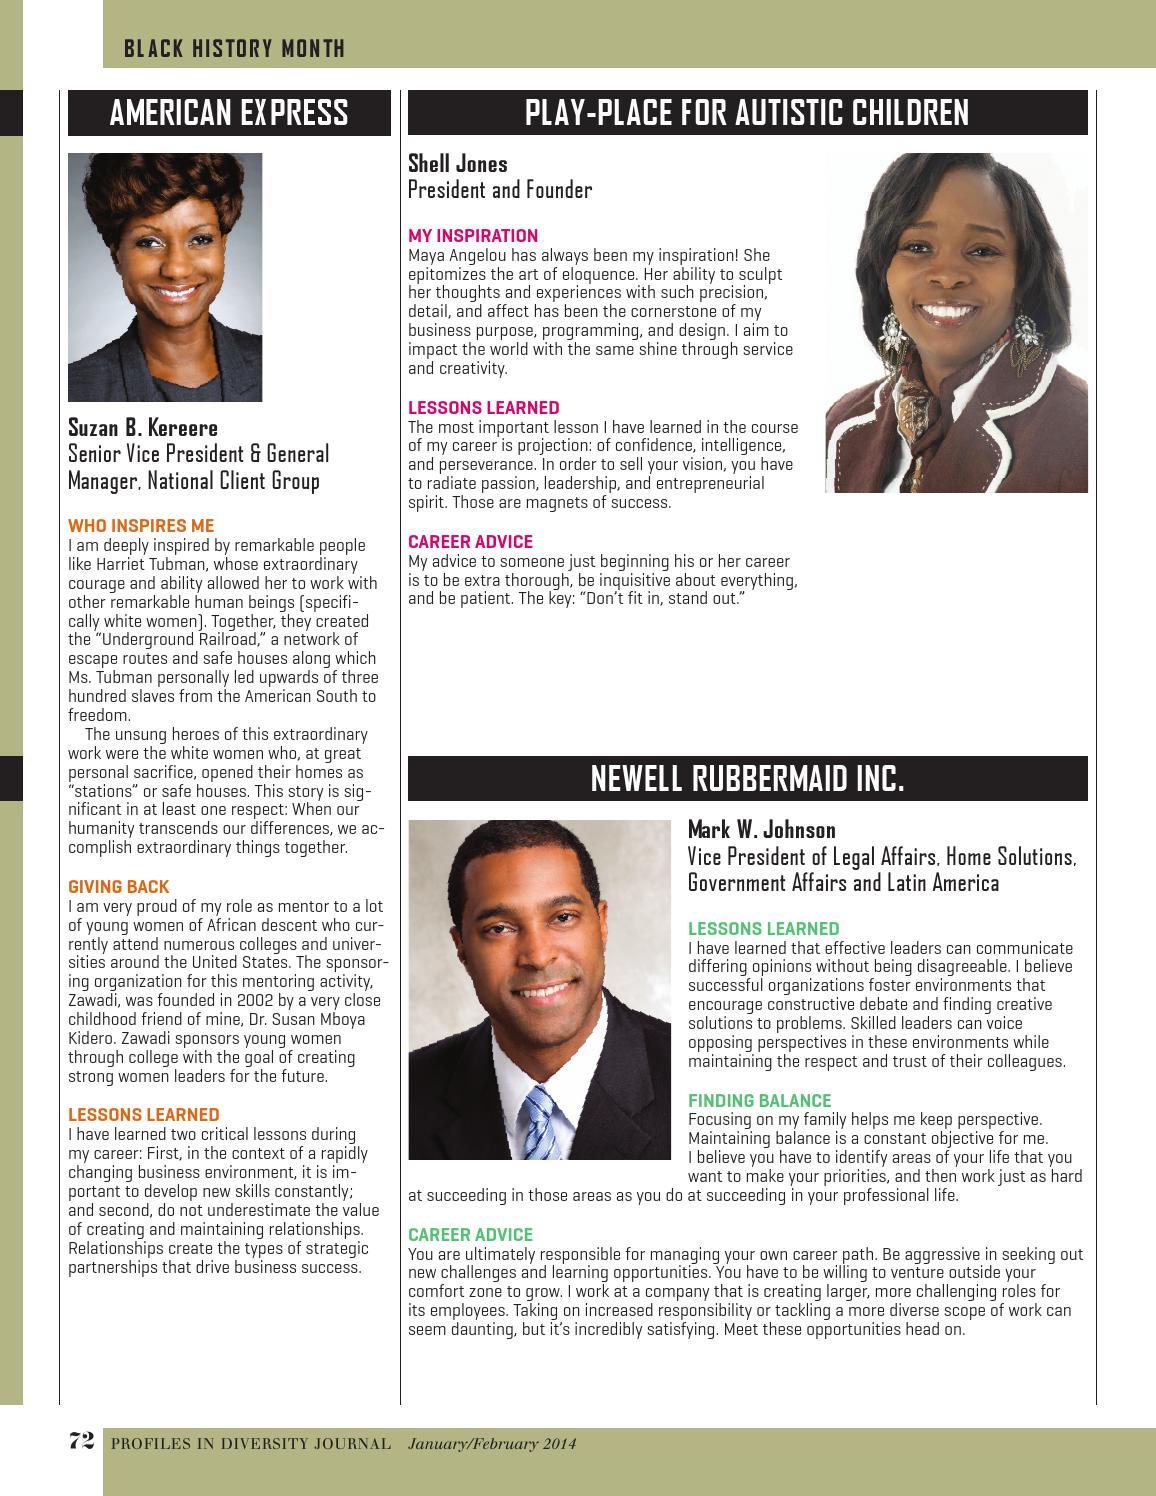 Diversity Journal - Jan/Feb 2014